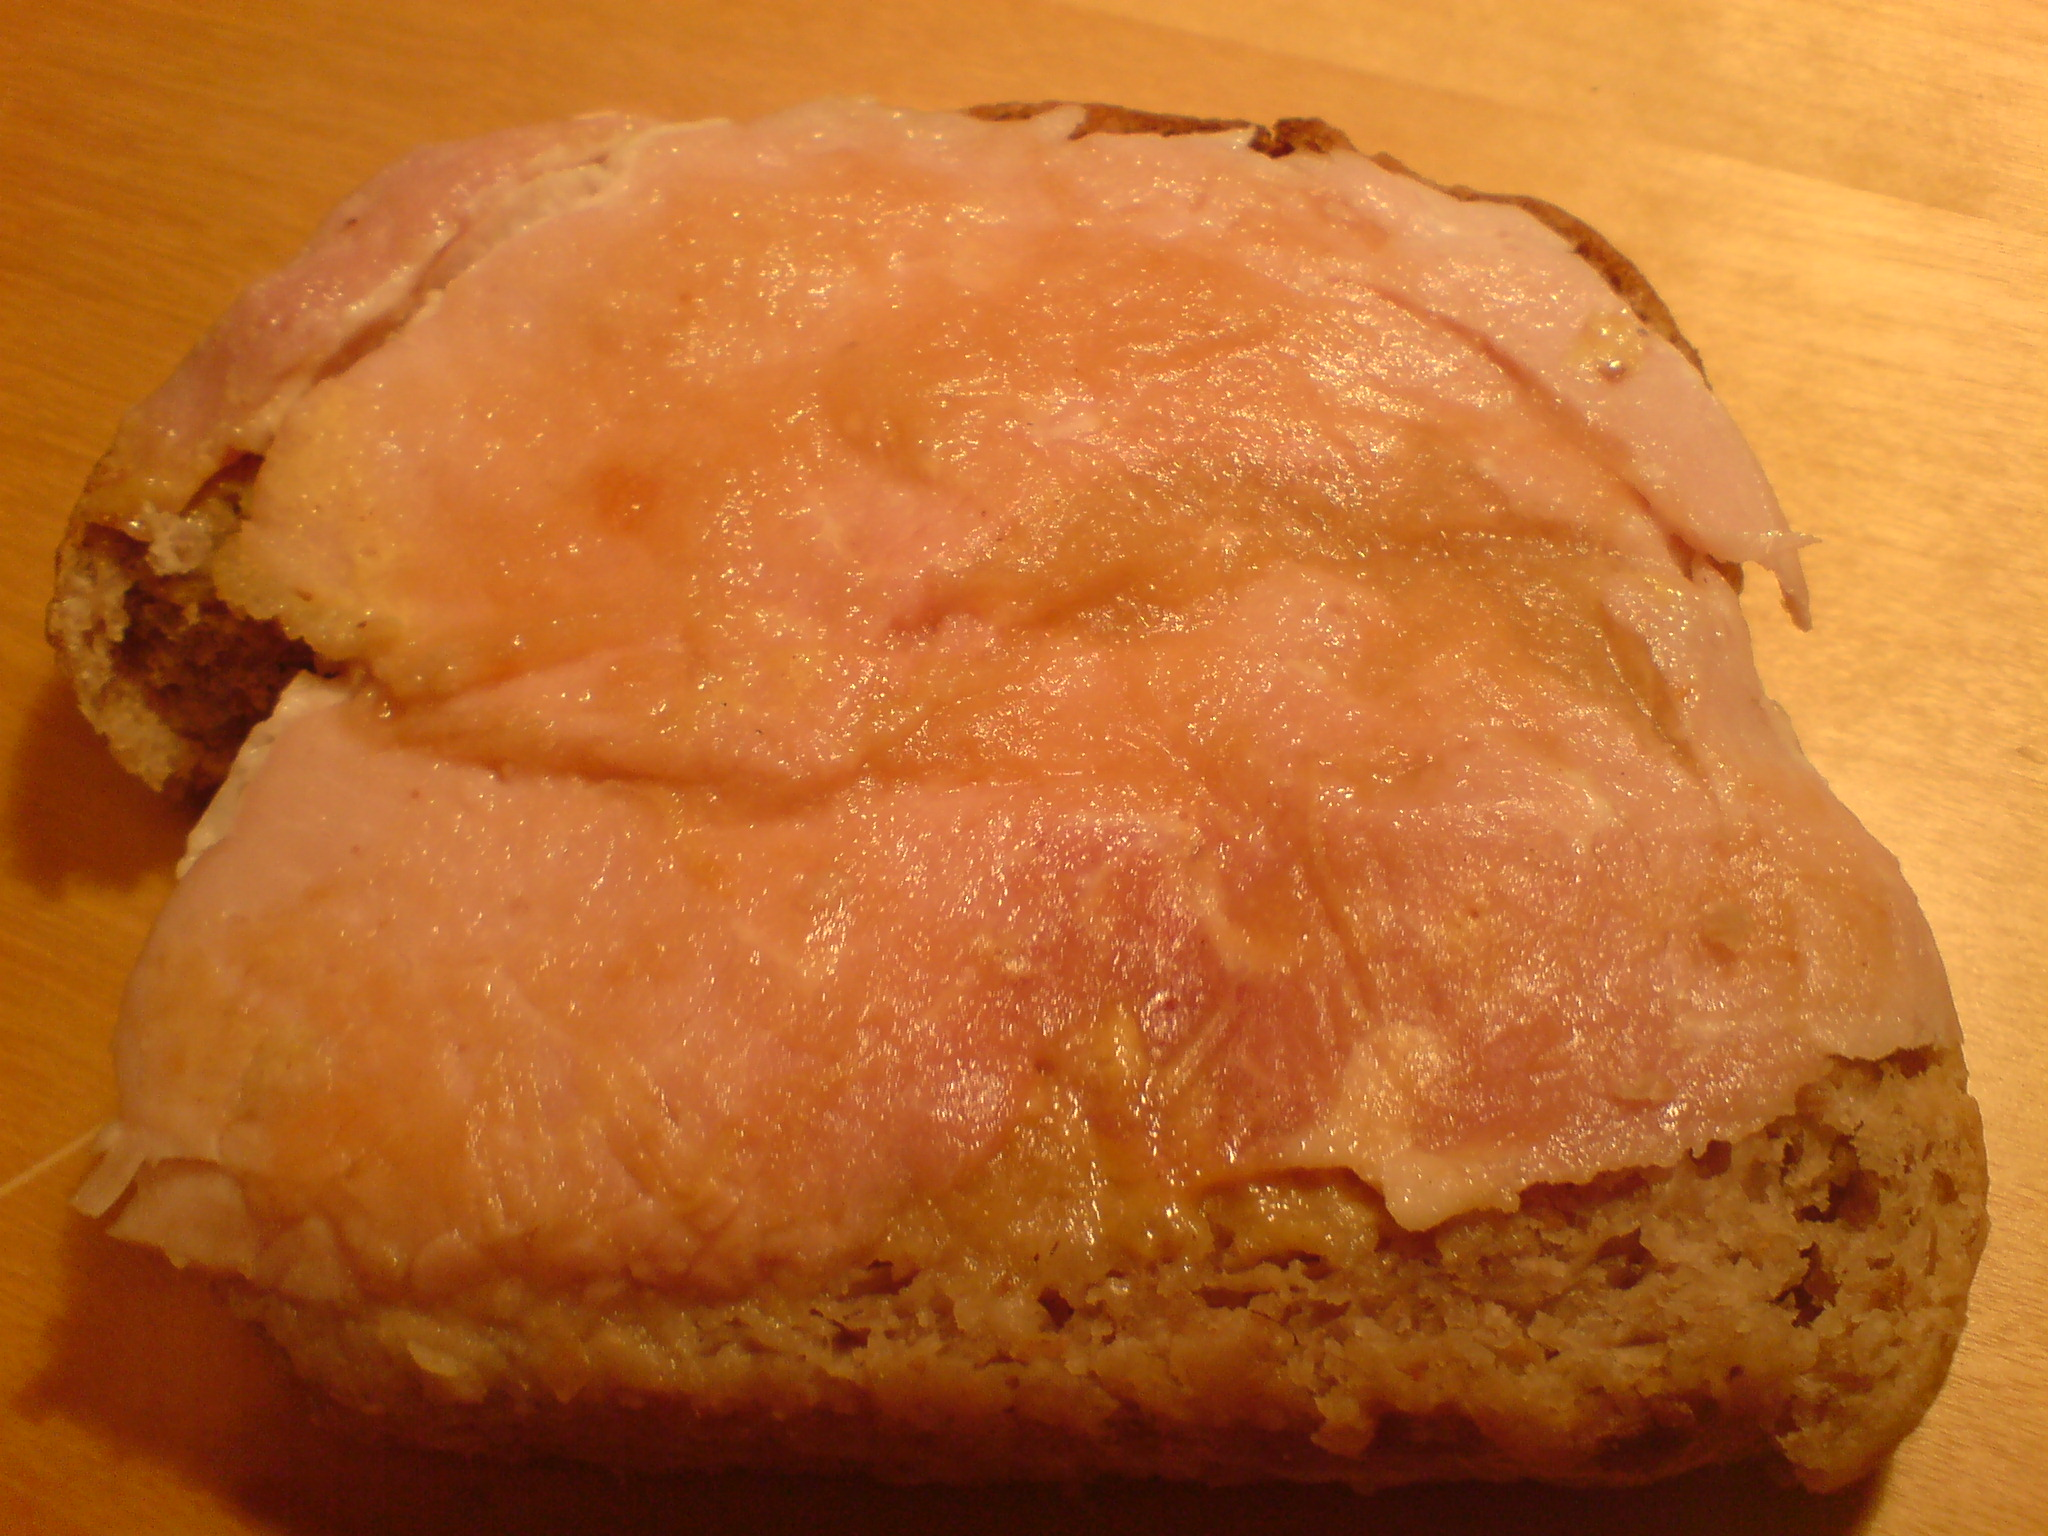 Skinka på valnötsbröd